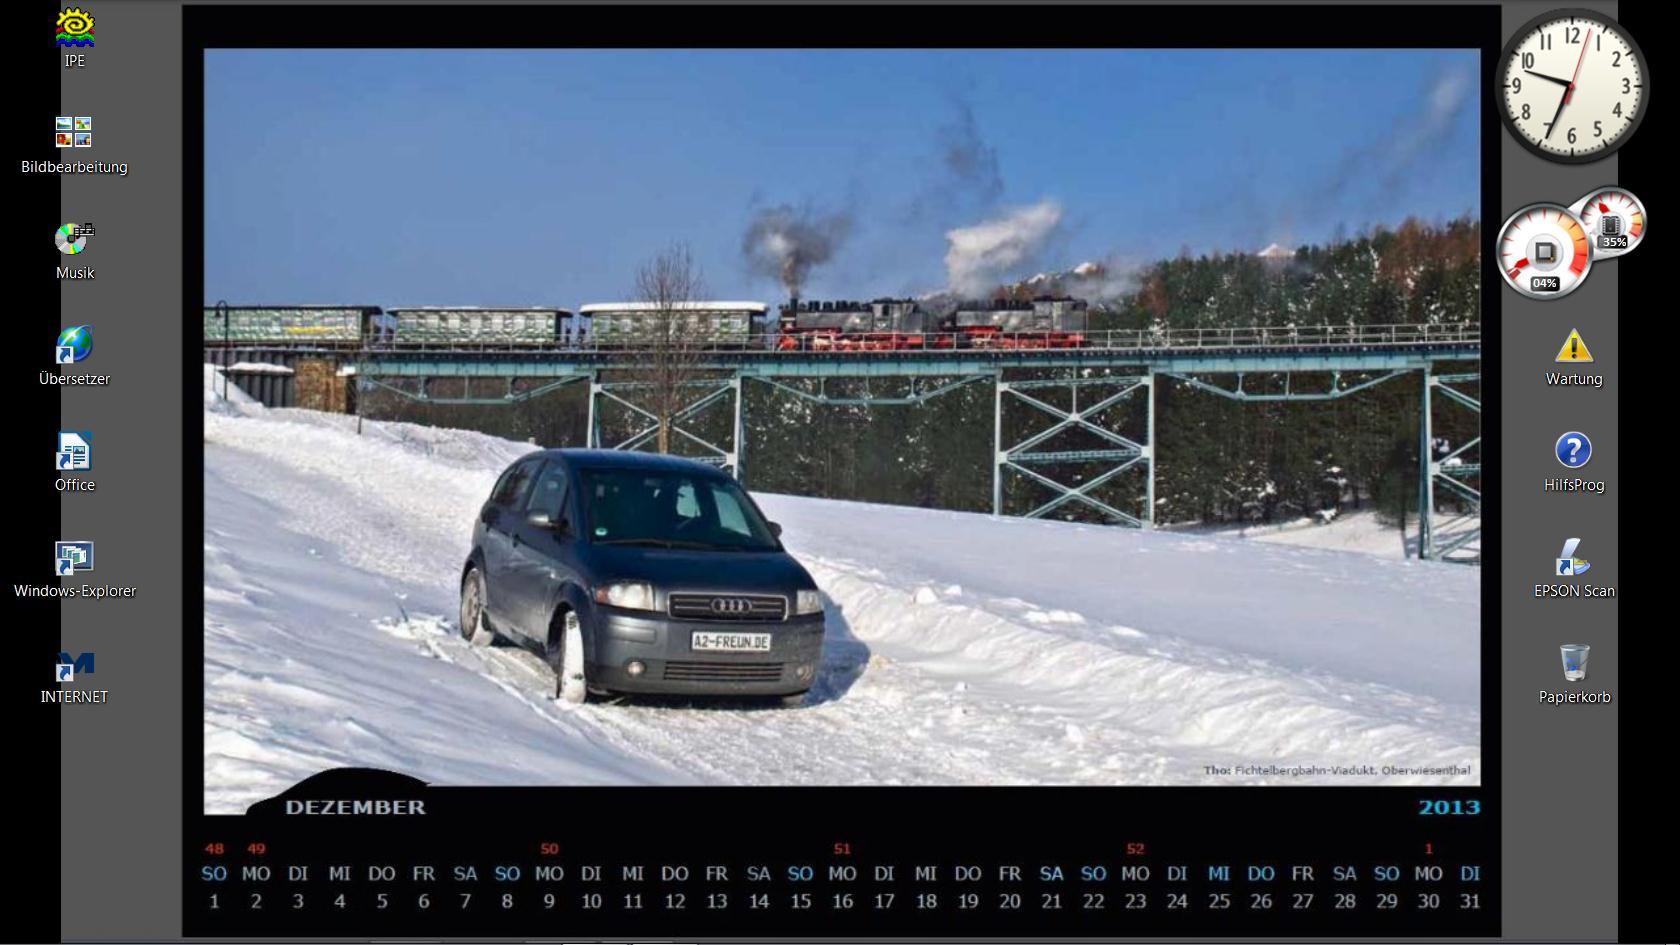 2012-12-15.jpg.936c29bf6edd6fd17a6f3348c4c93dec.jpg